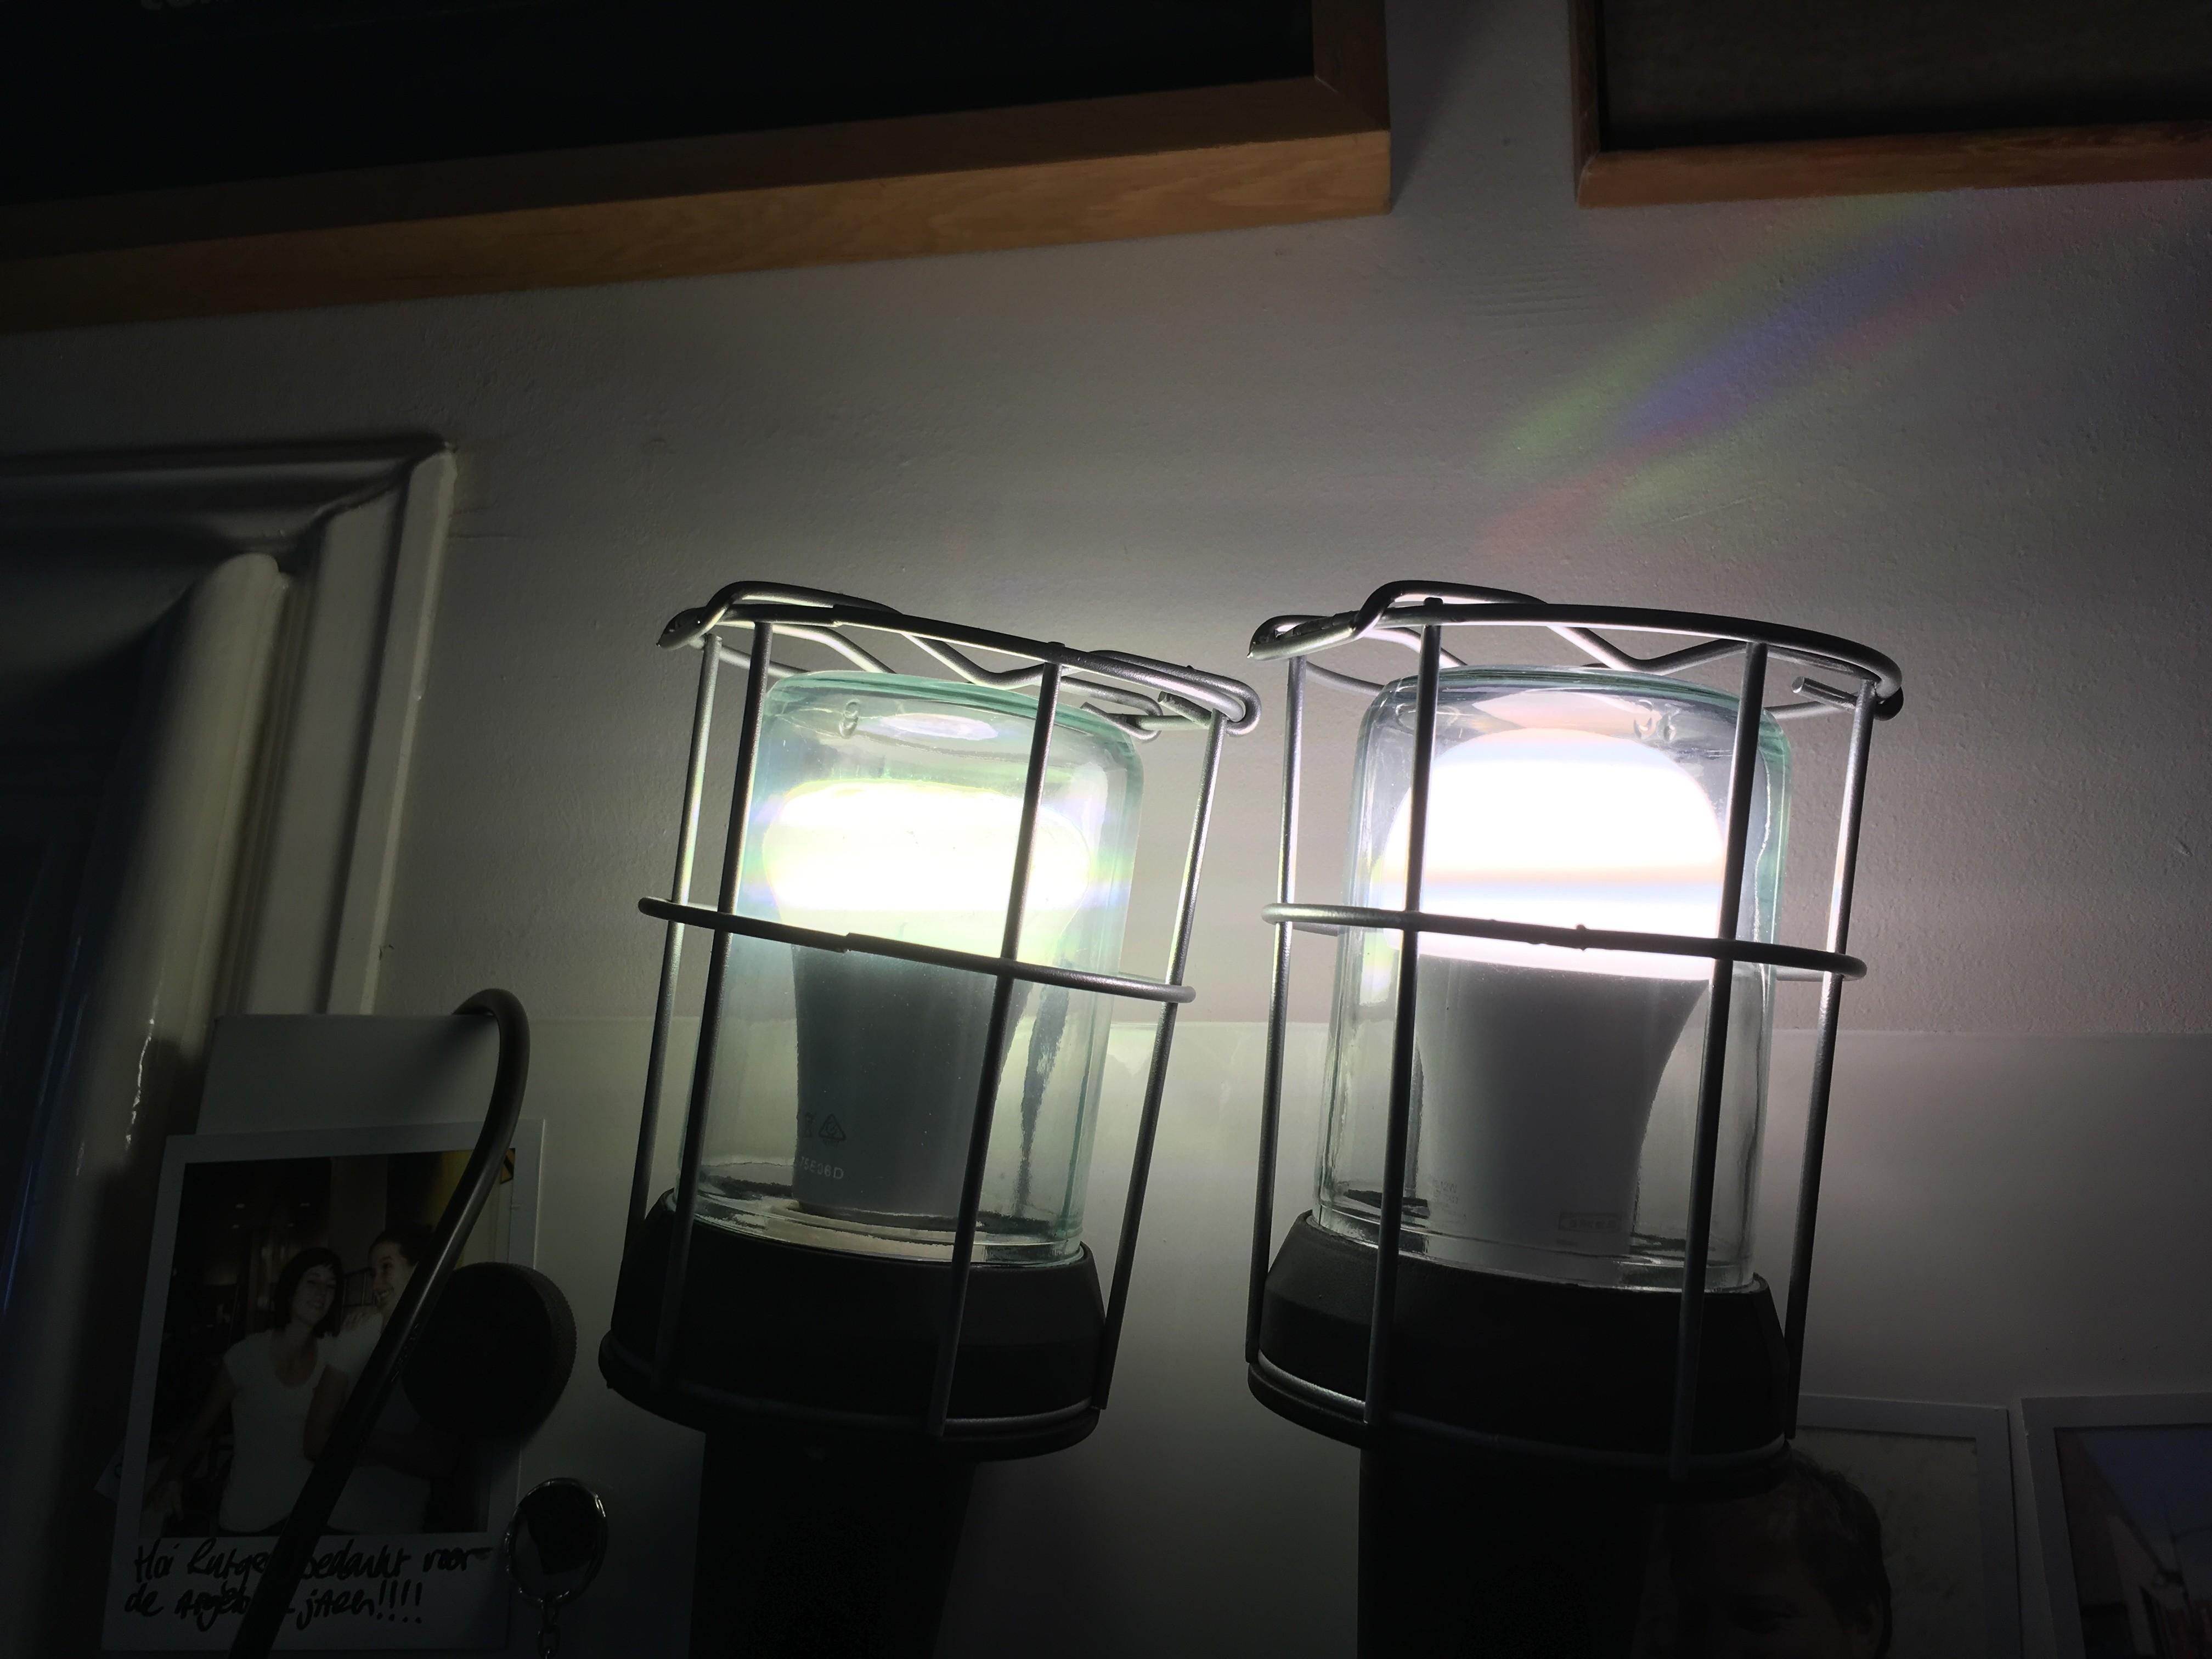 duurtest slimme lampen ikea tradfri vs philips hue. Black Bedroom Furniture Sets. Home Design Ideas